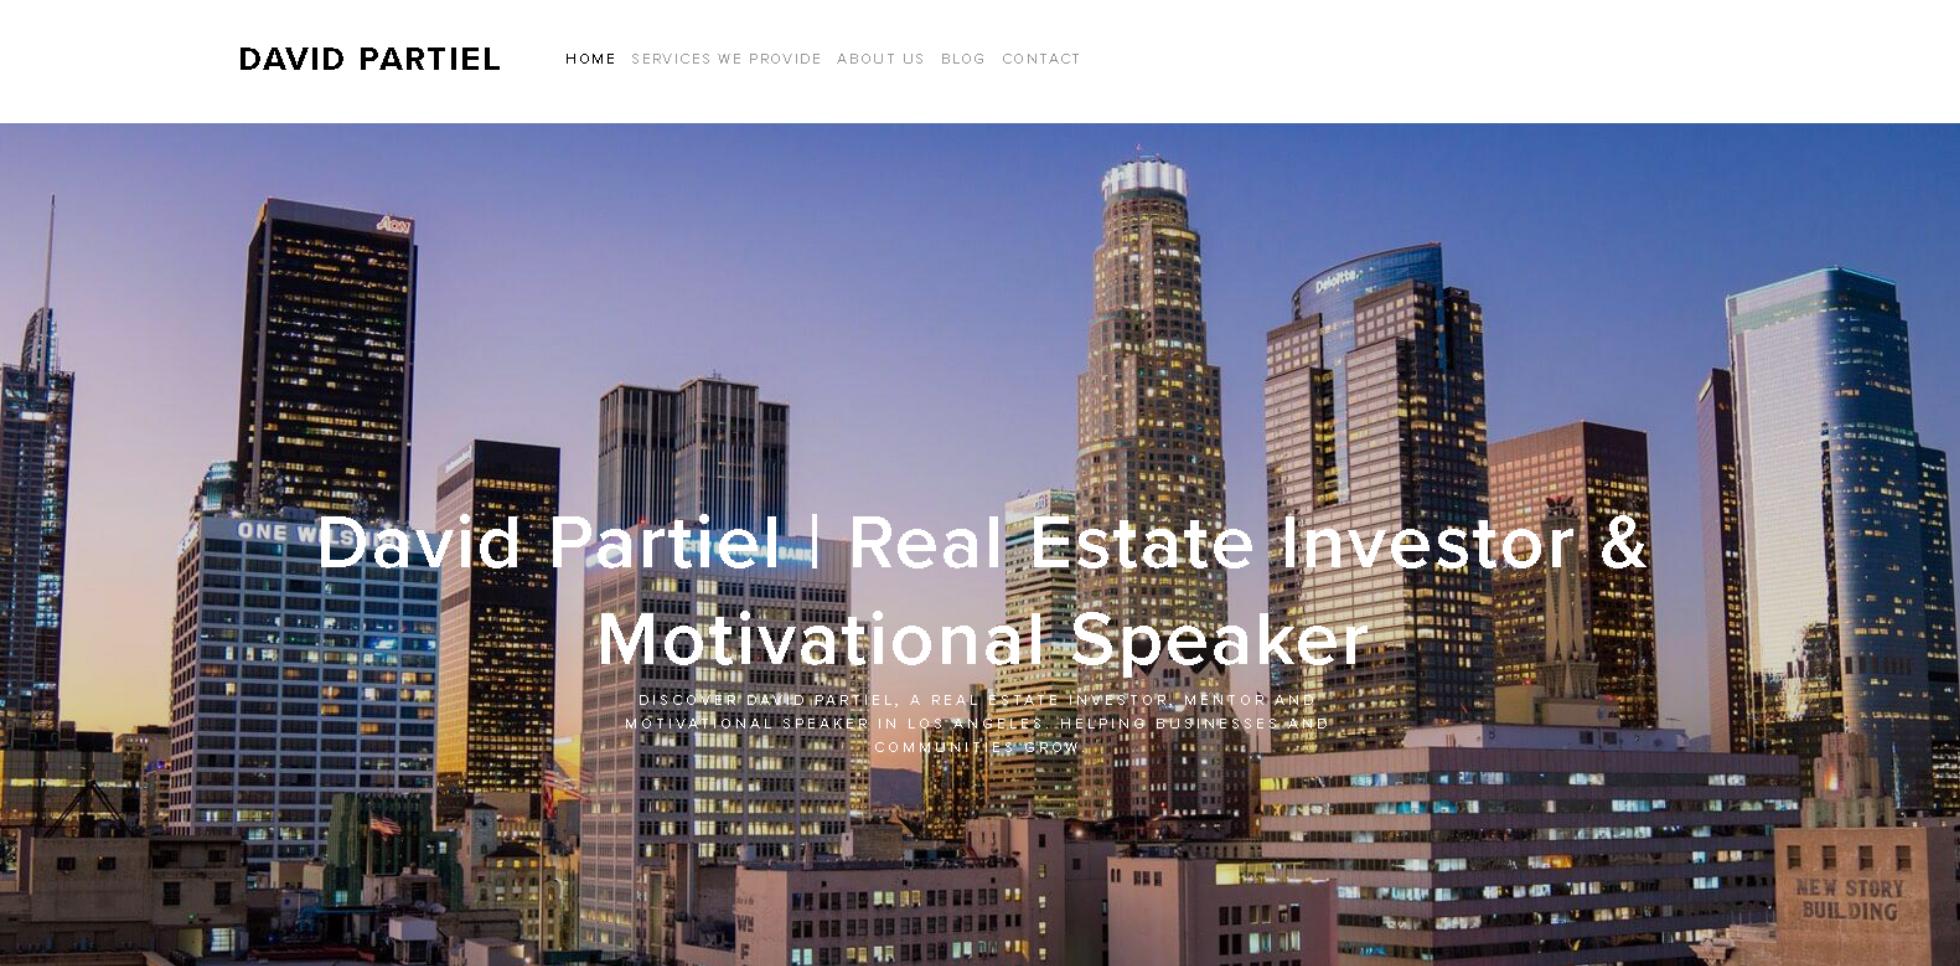 David Partiel Website